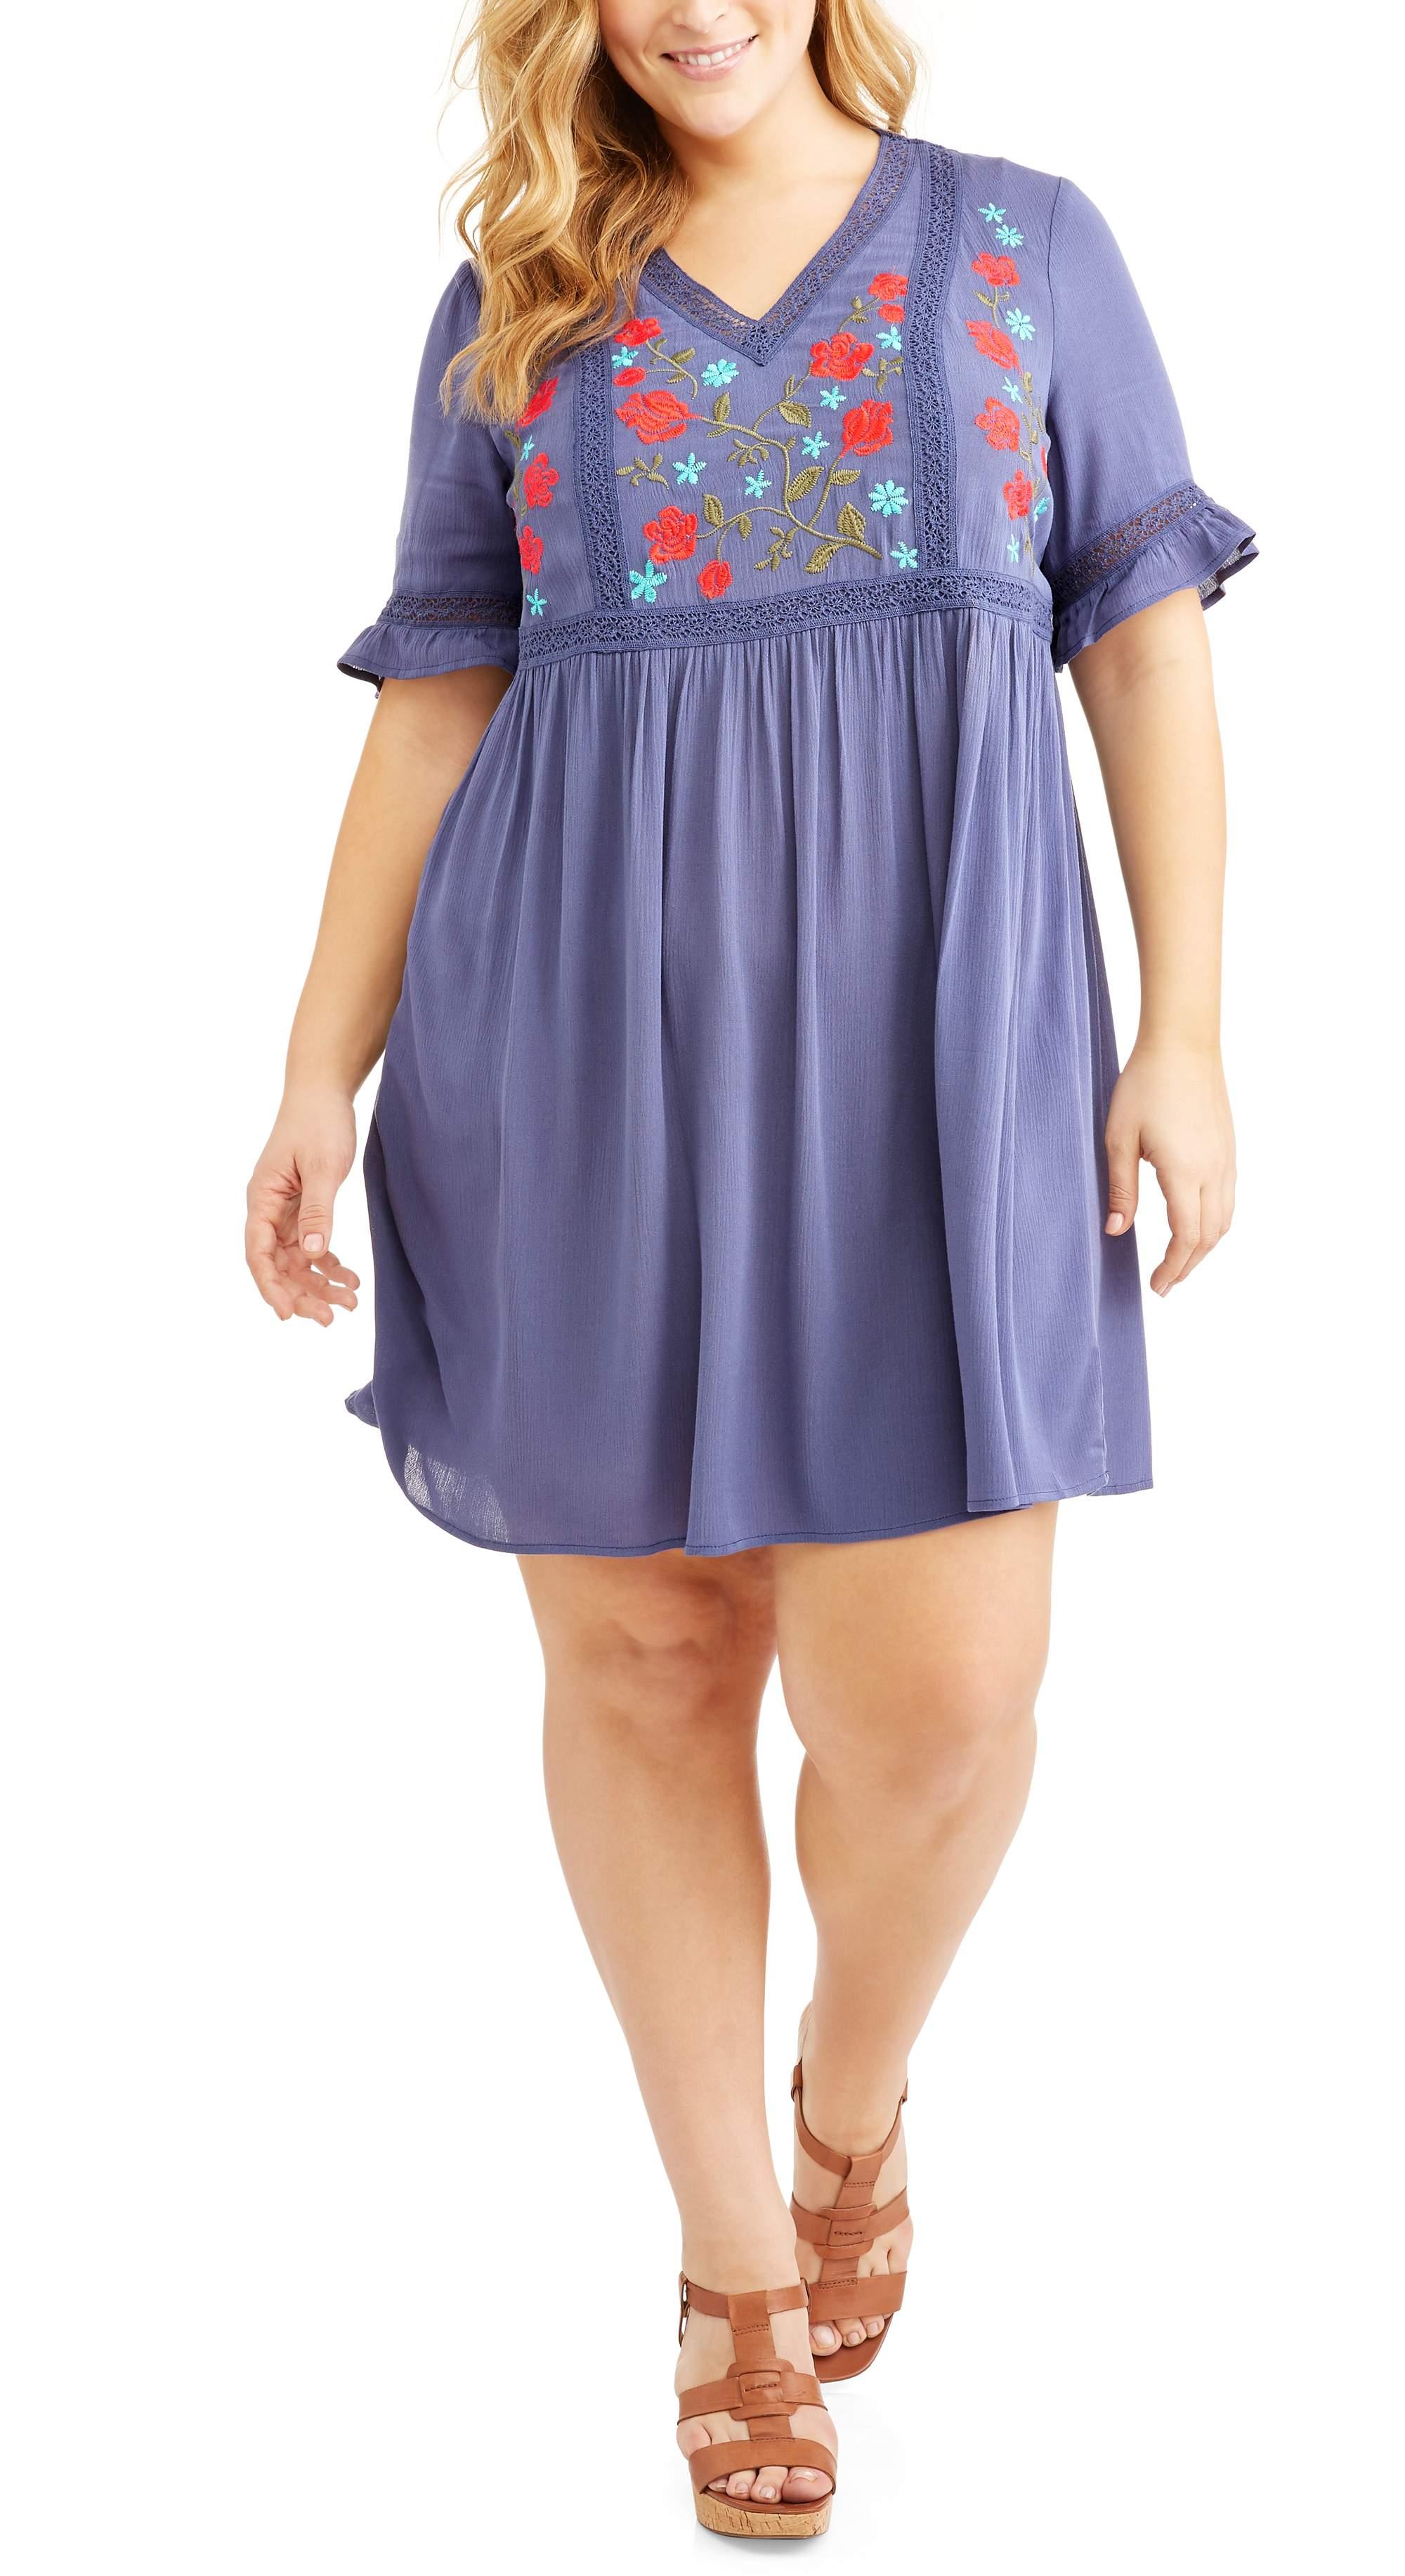 Women s Plus Size Clothing